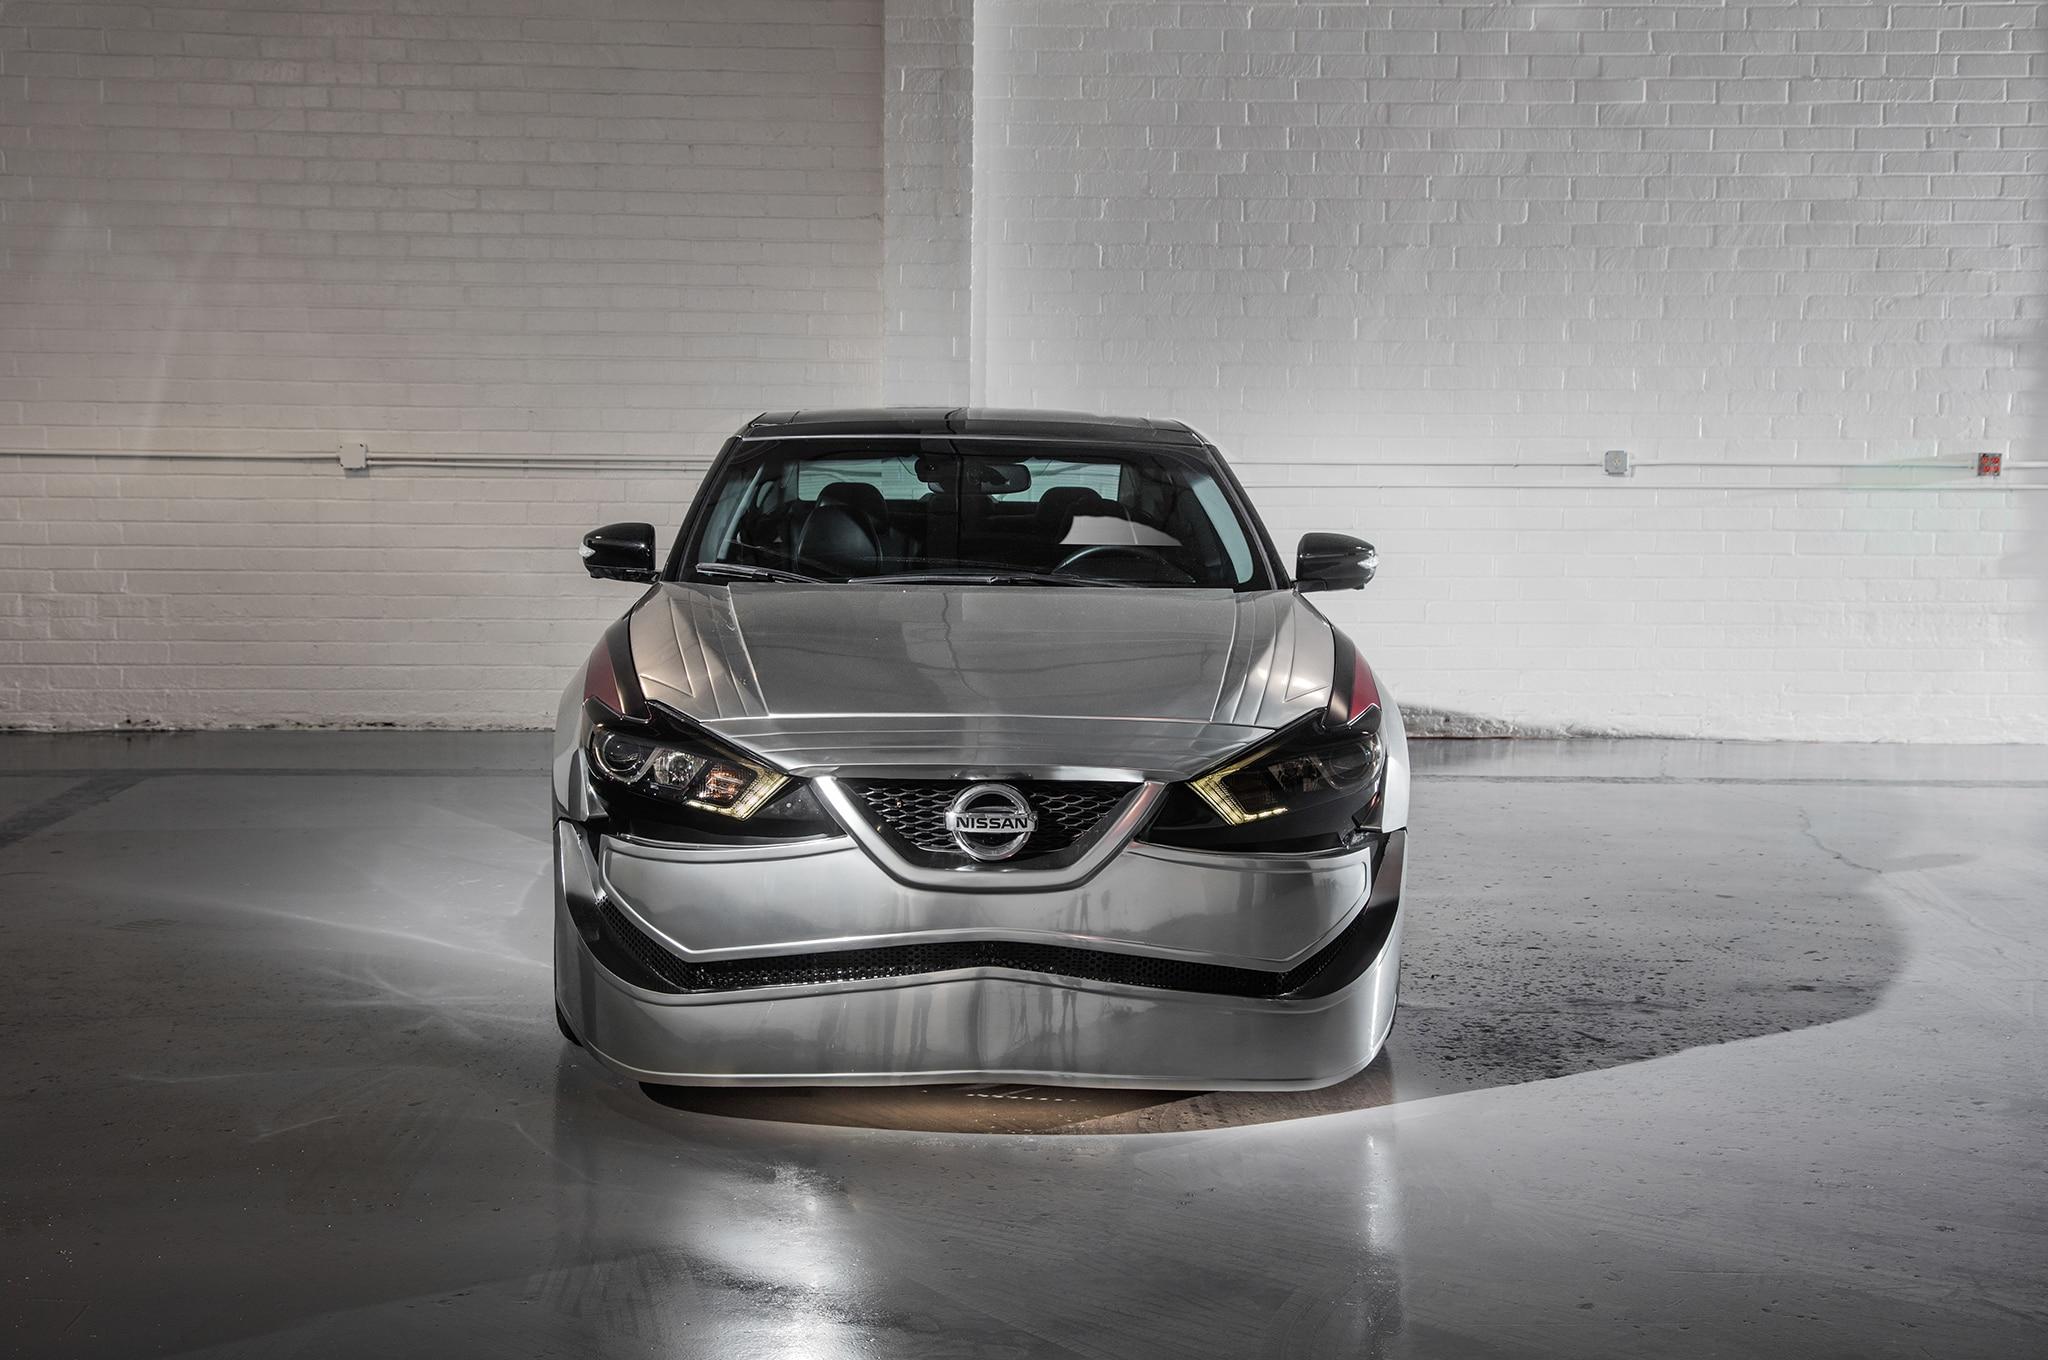 2018 Nissan Maxima Show Car Captain Phasma Front